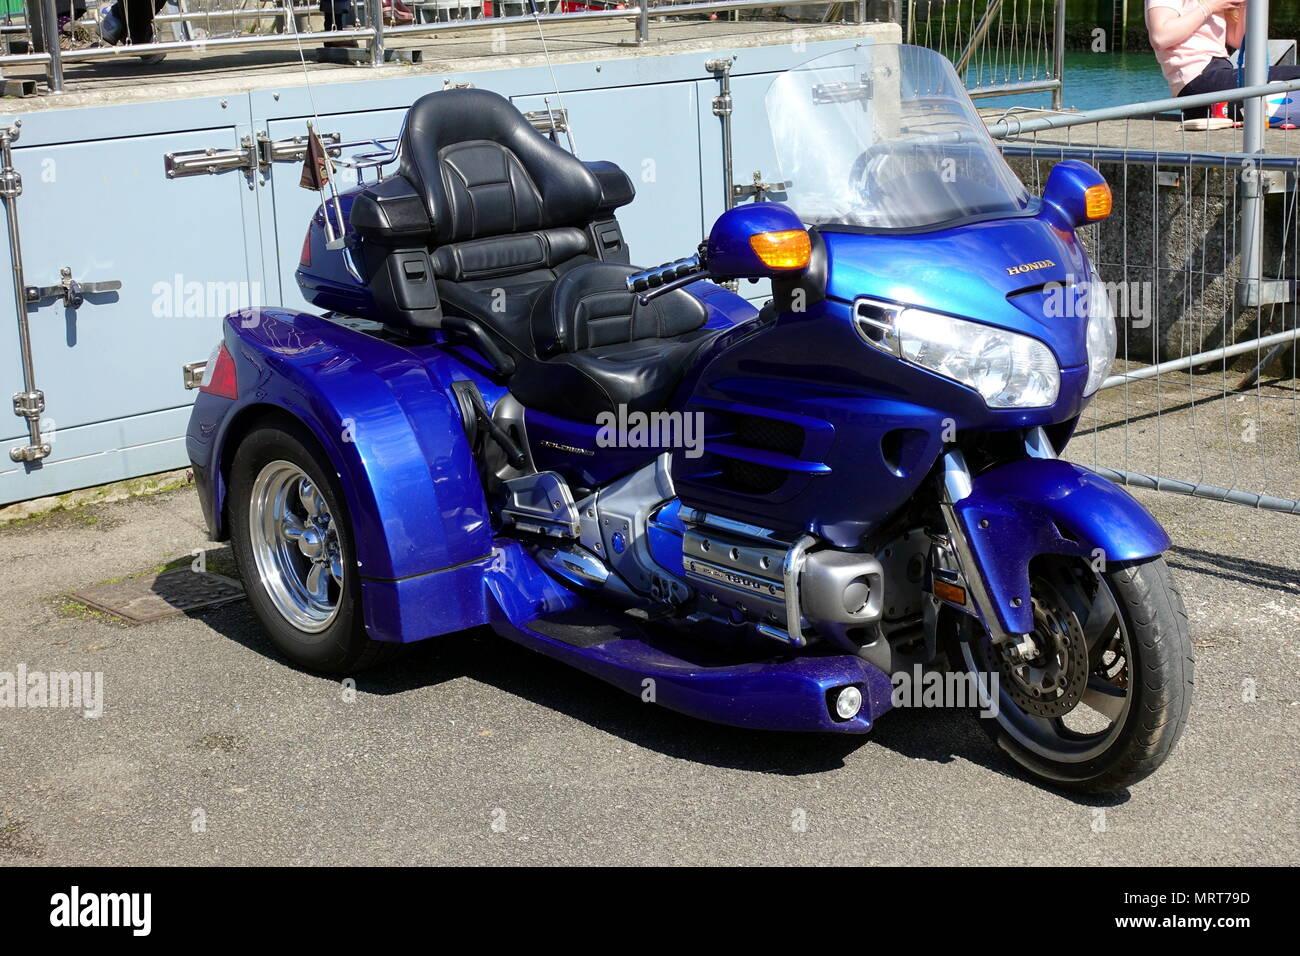 Honda Goldwing Trike Stockfotos Honda Goldwing Trike Bilder Alamy